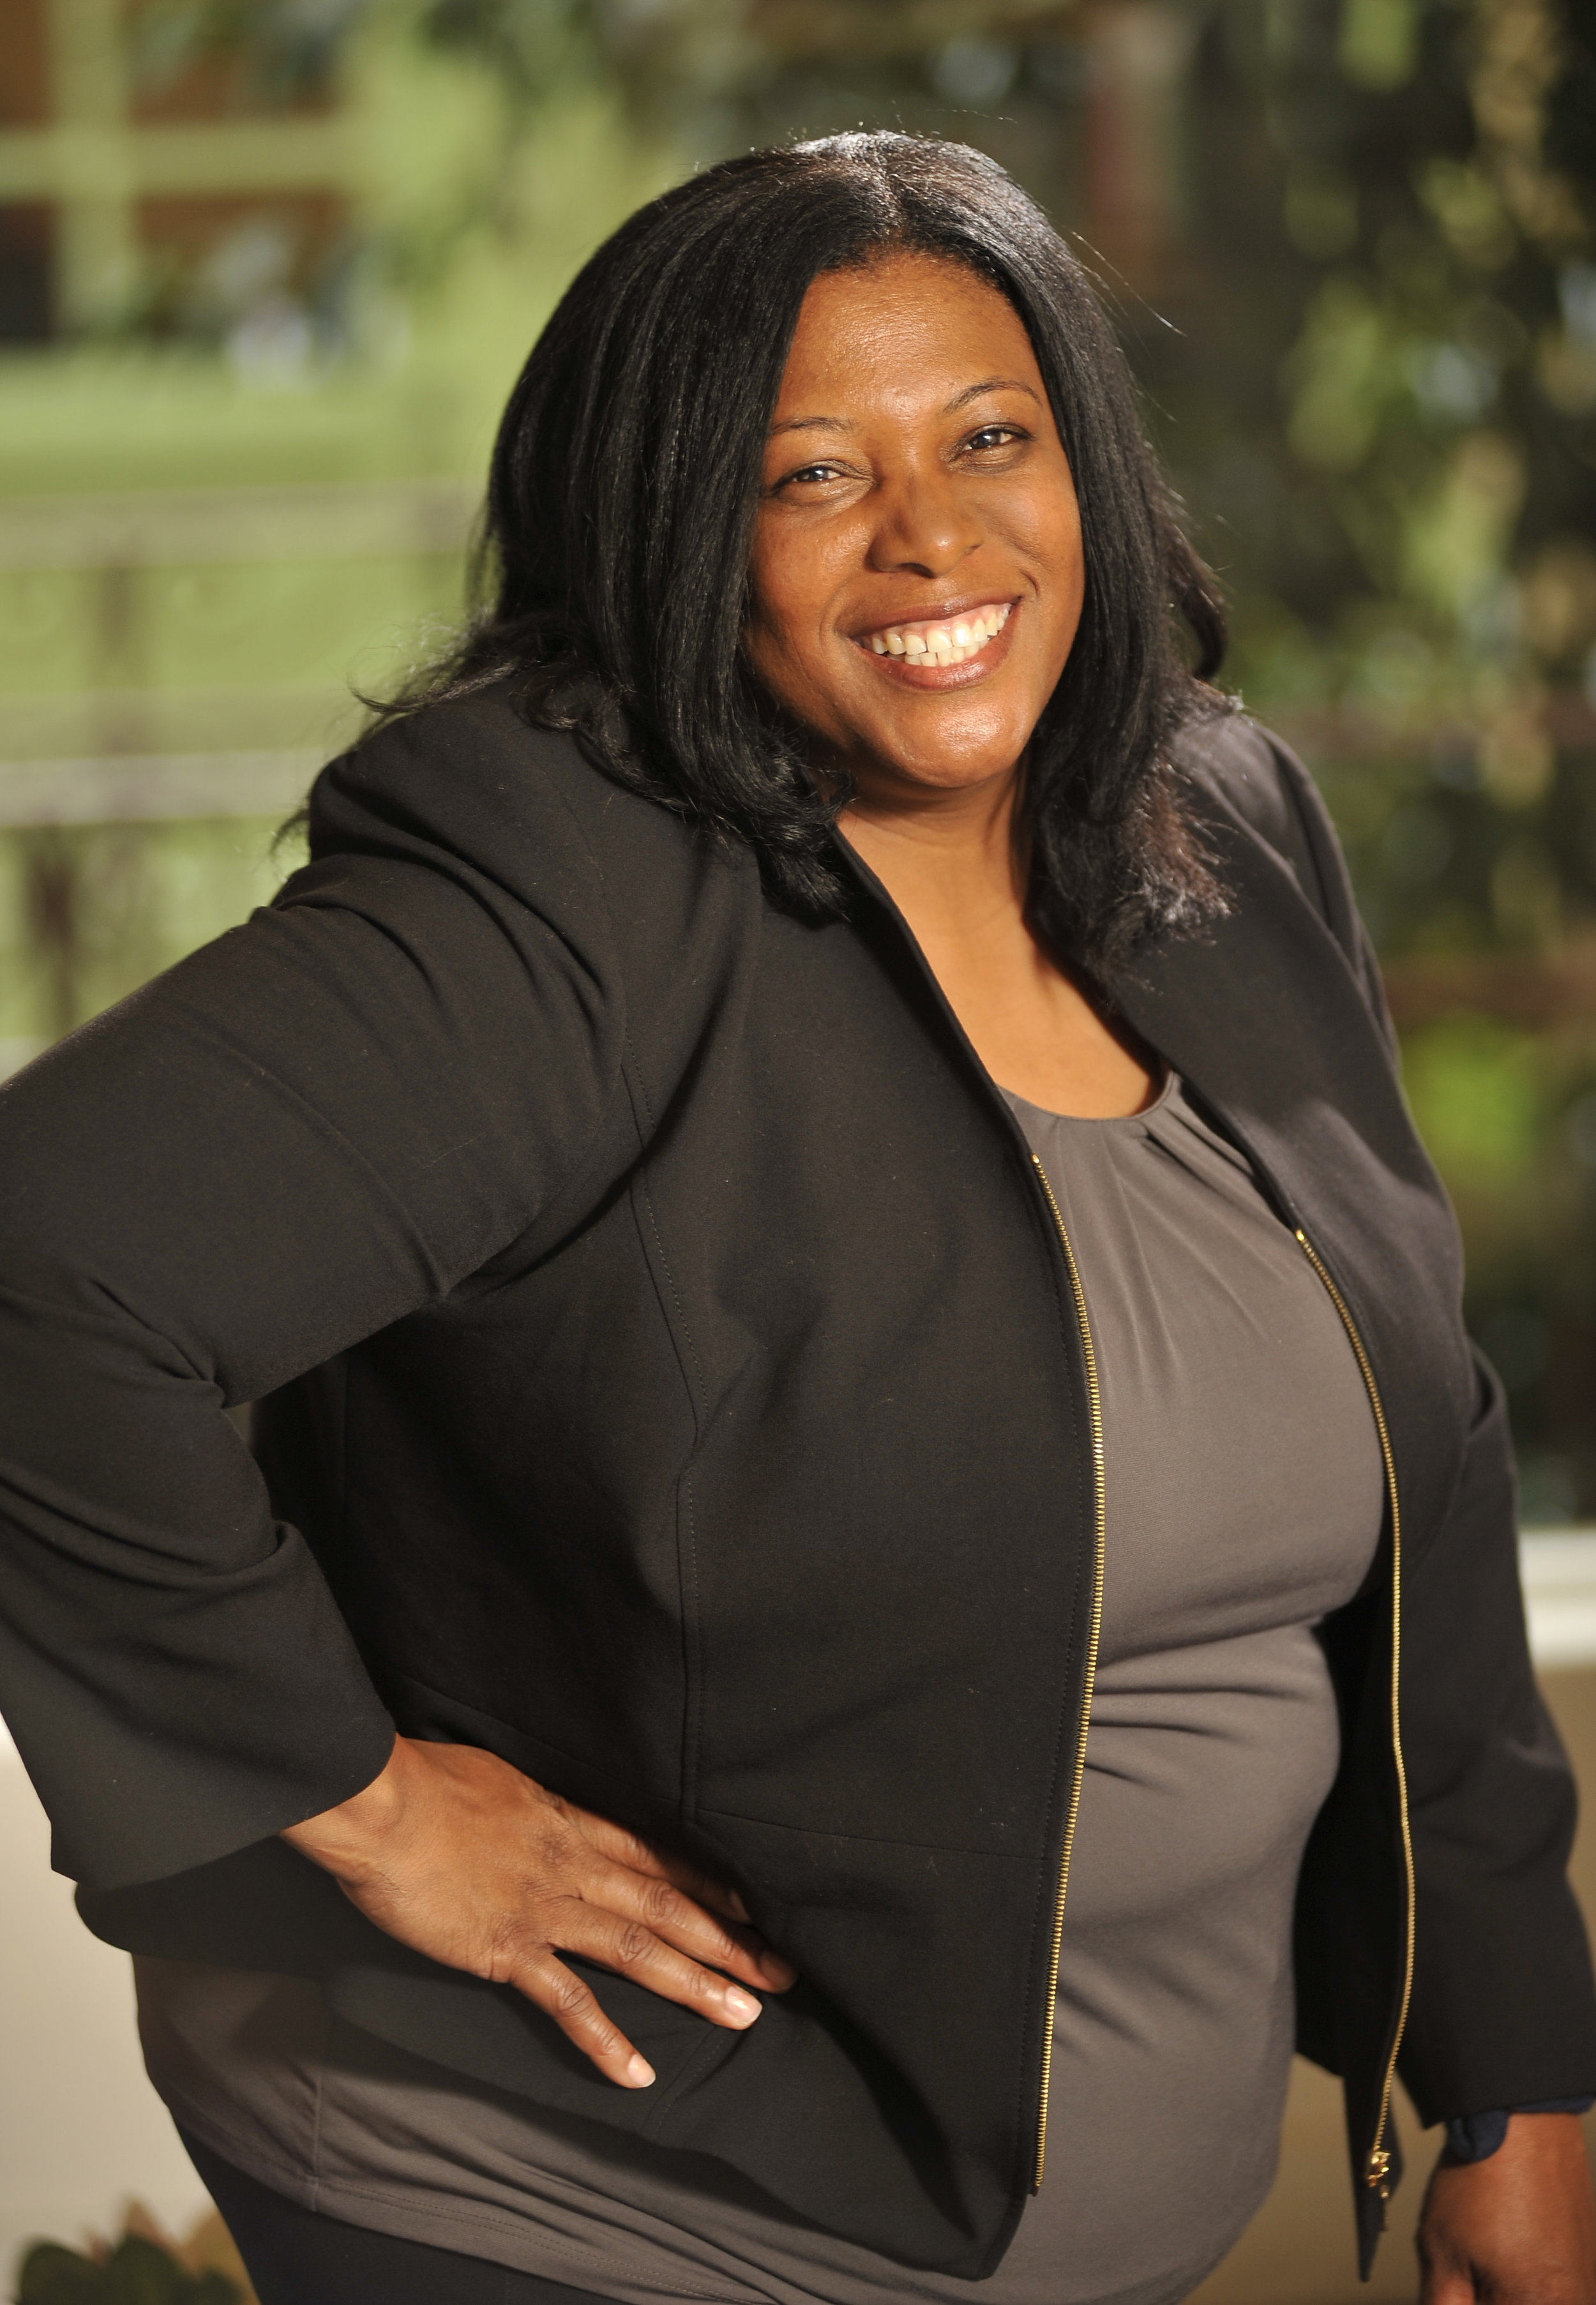 Kim KiruiExecutive Administrative Assistant - kimberly@imaginela.org